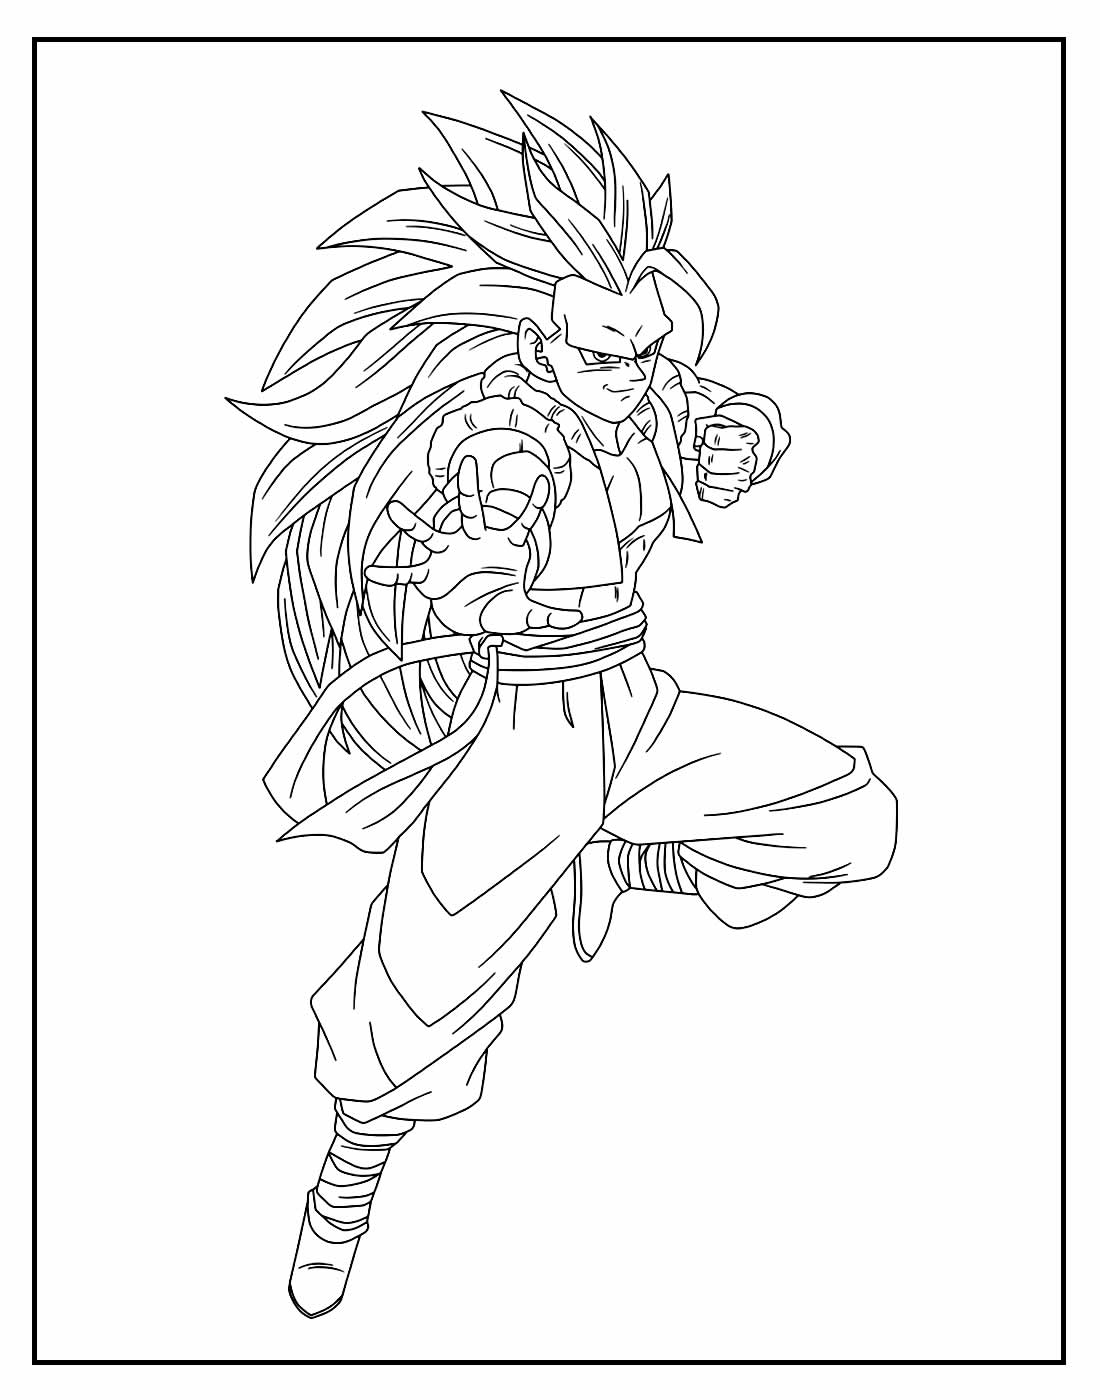 Página para colorir Dragon Ball Z